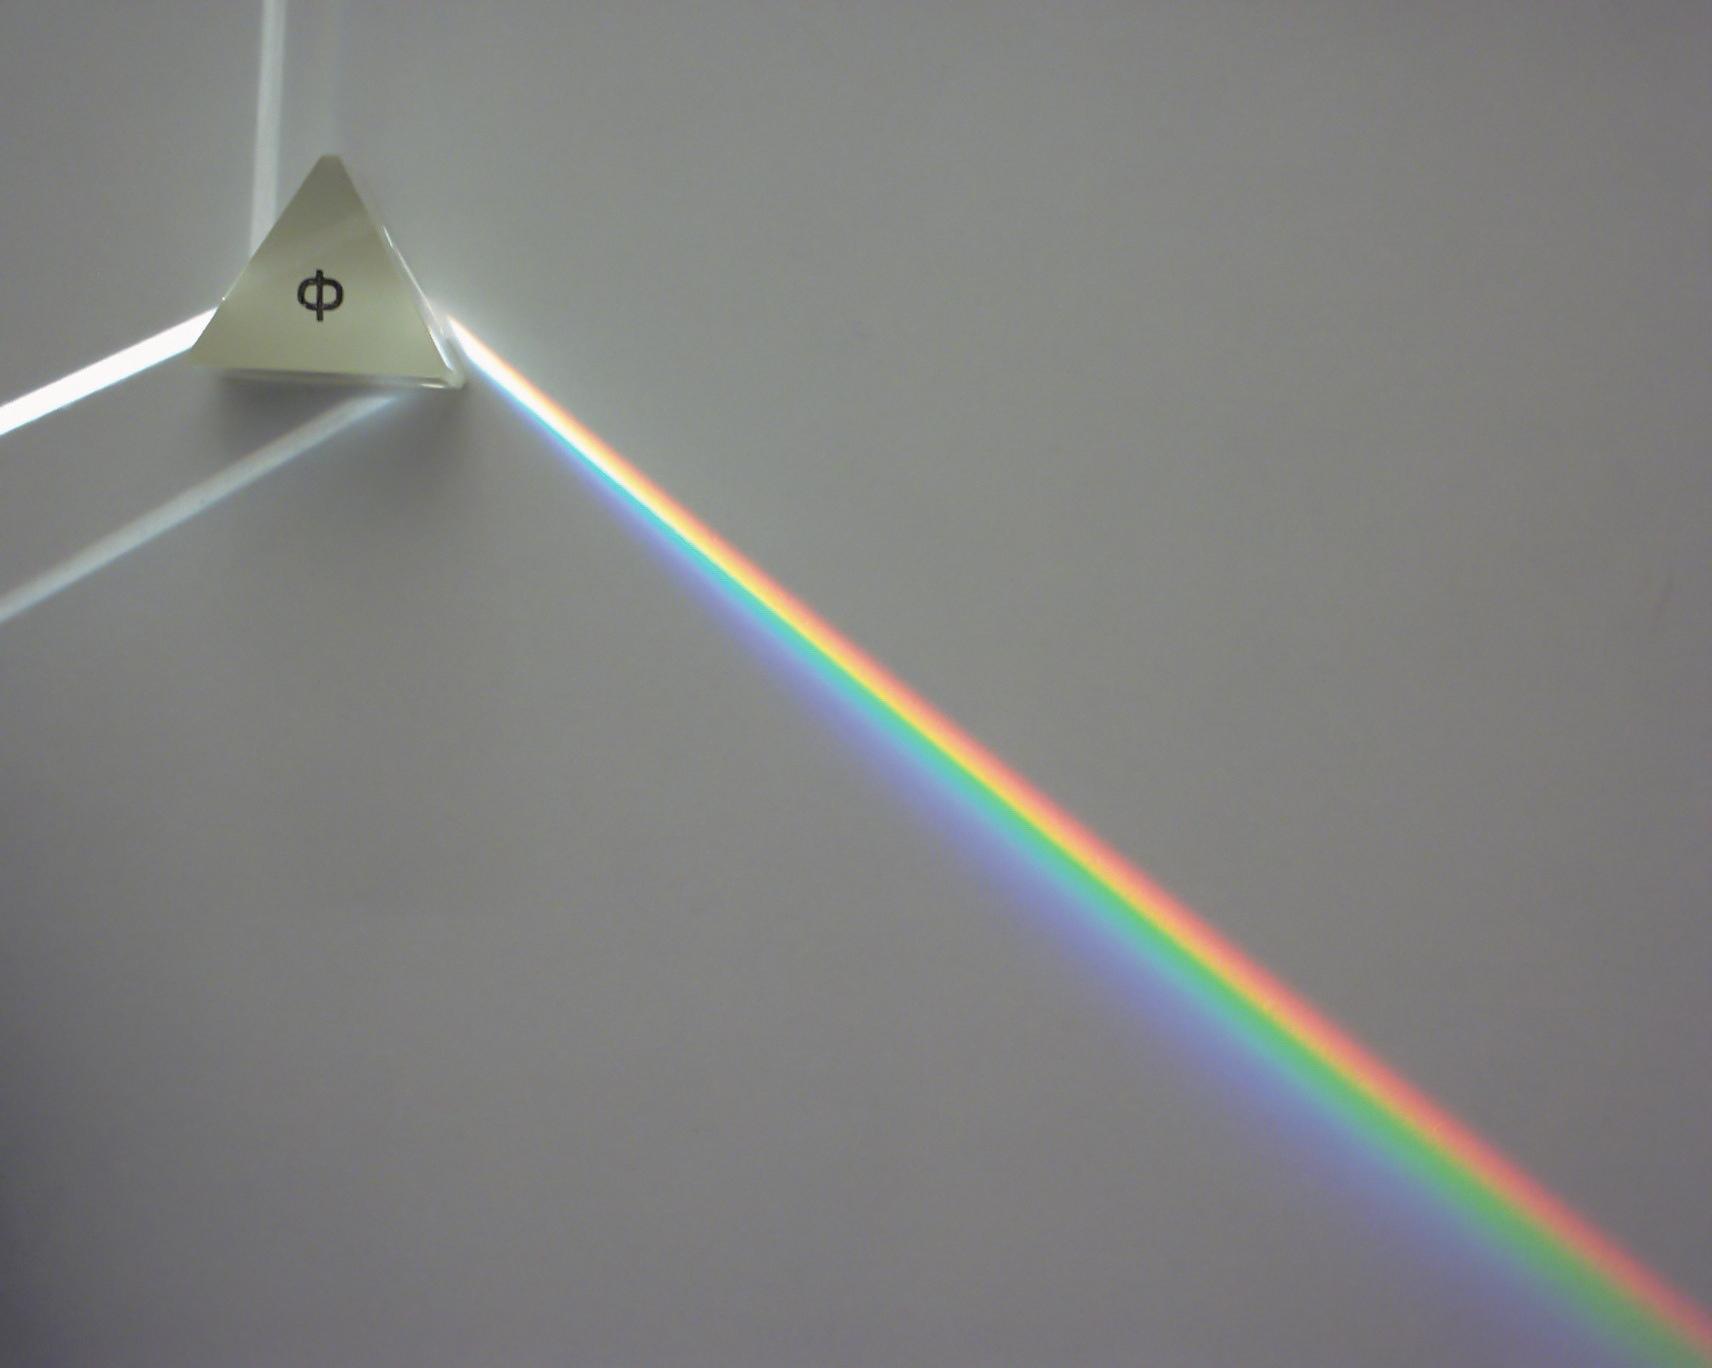 prisme.jpg.d9fc9b3b16773a807b017b077d0e9c93.jpg